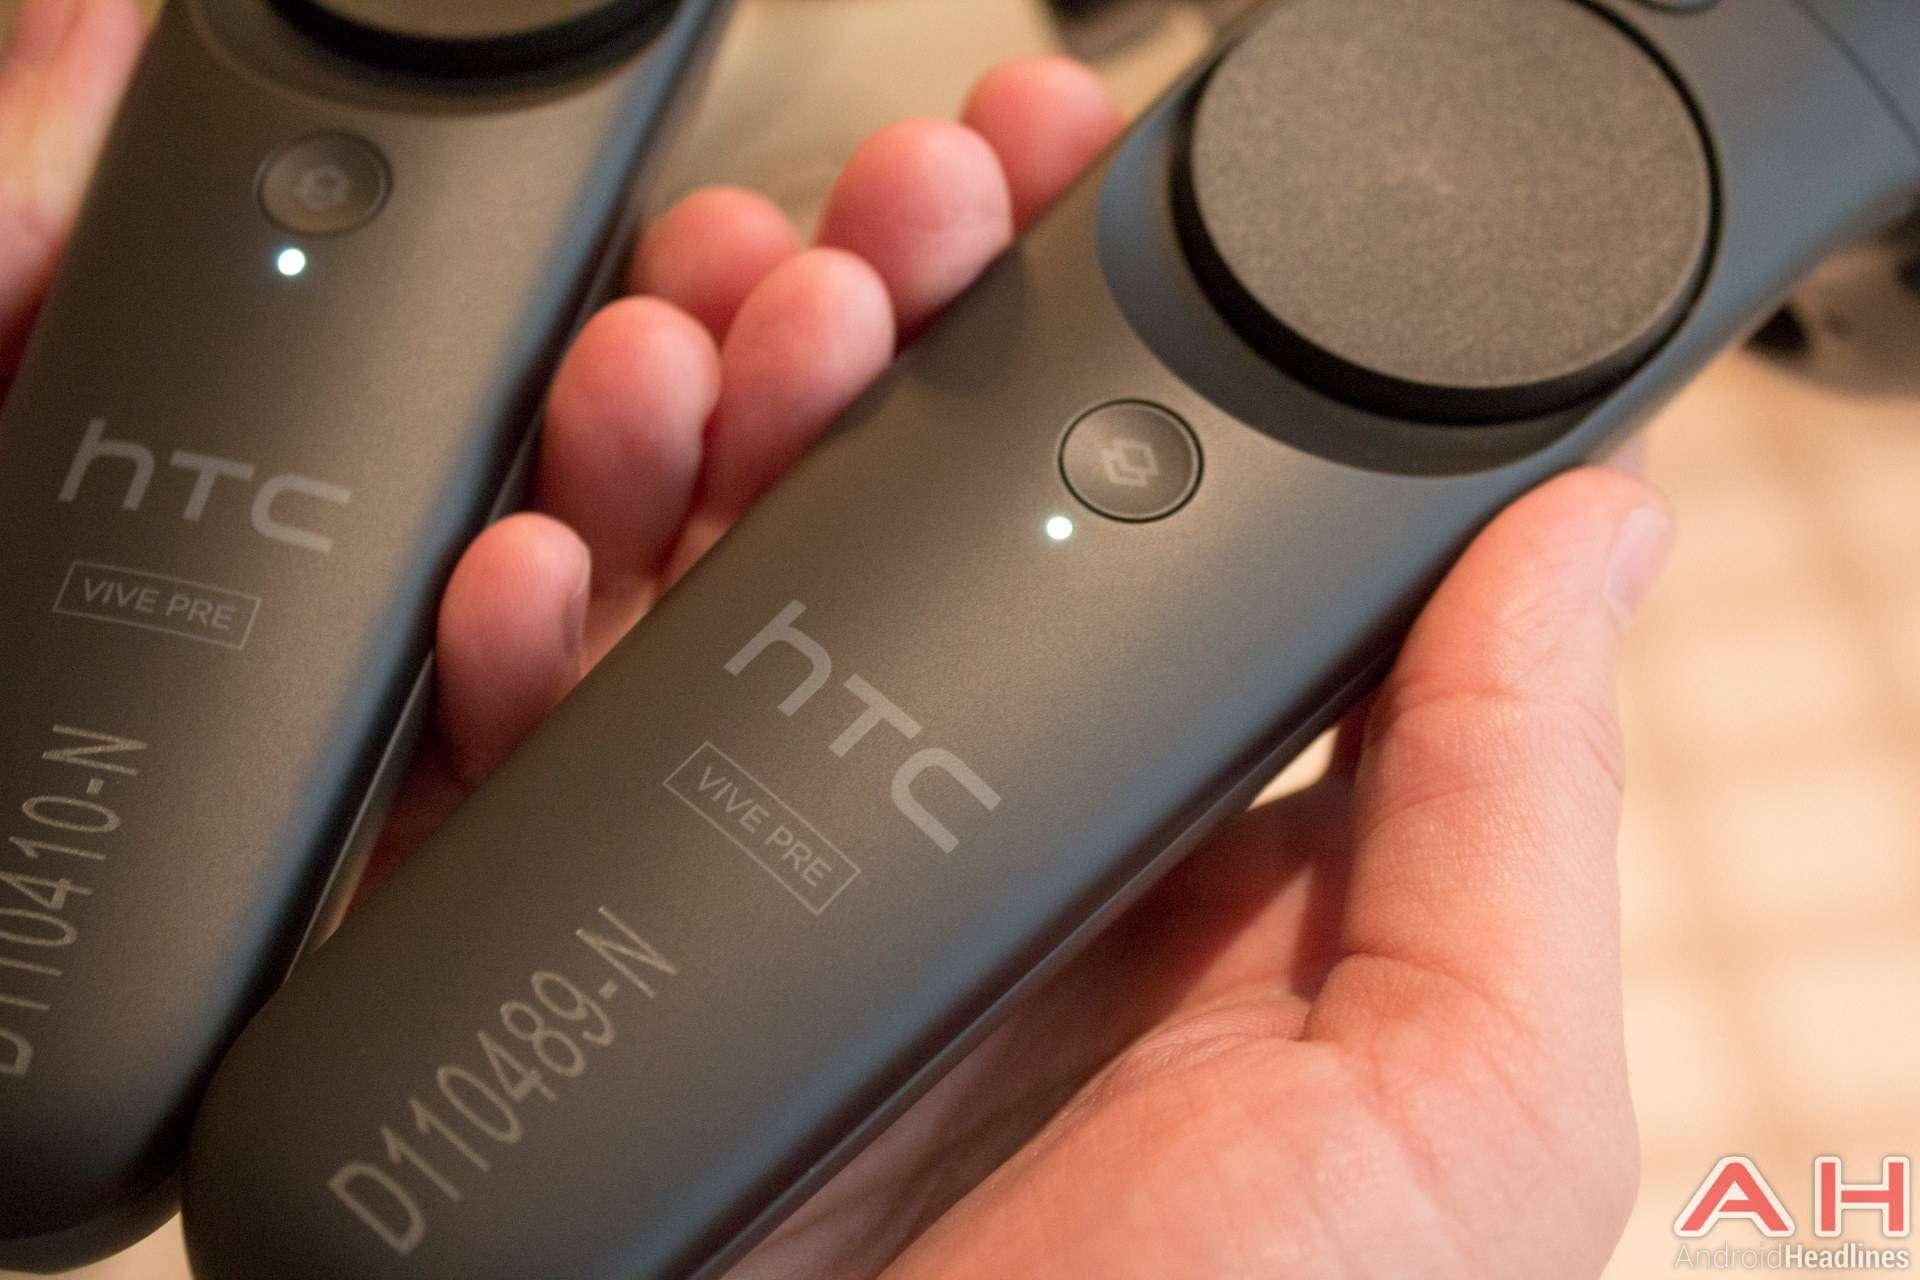 HTC Vive Pre AH 2 1